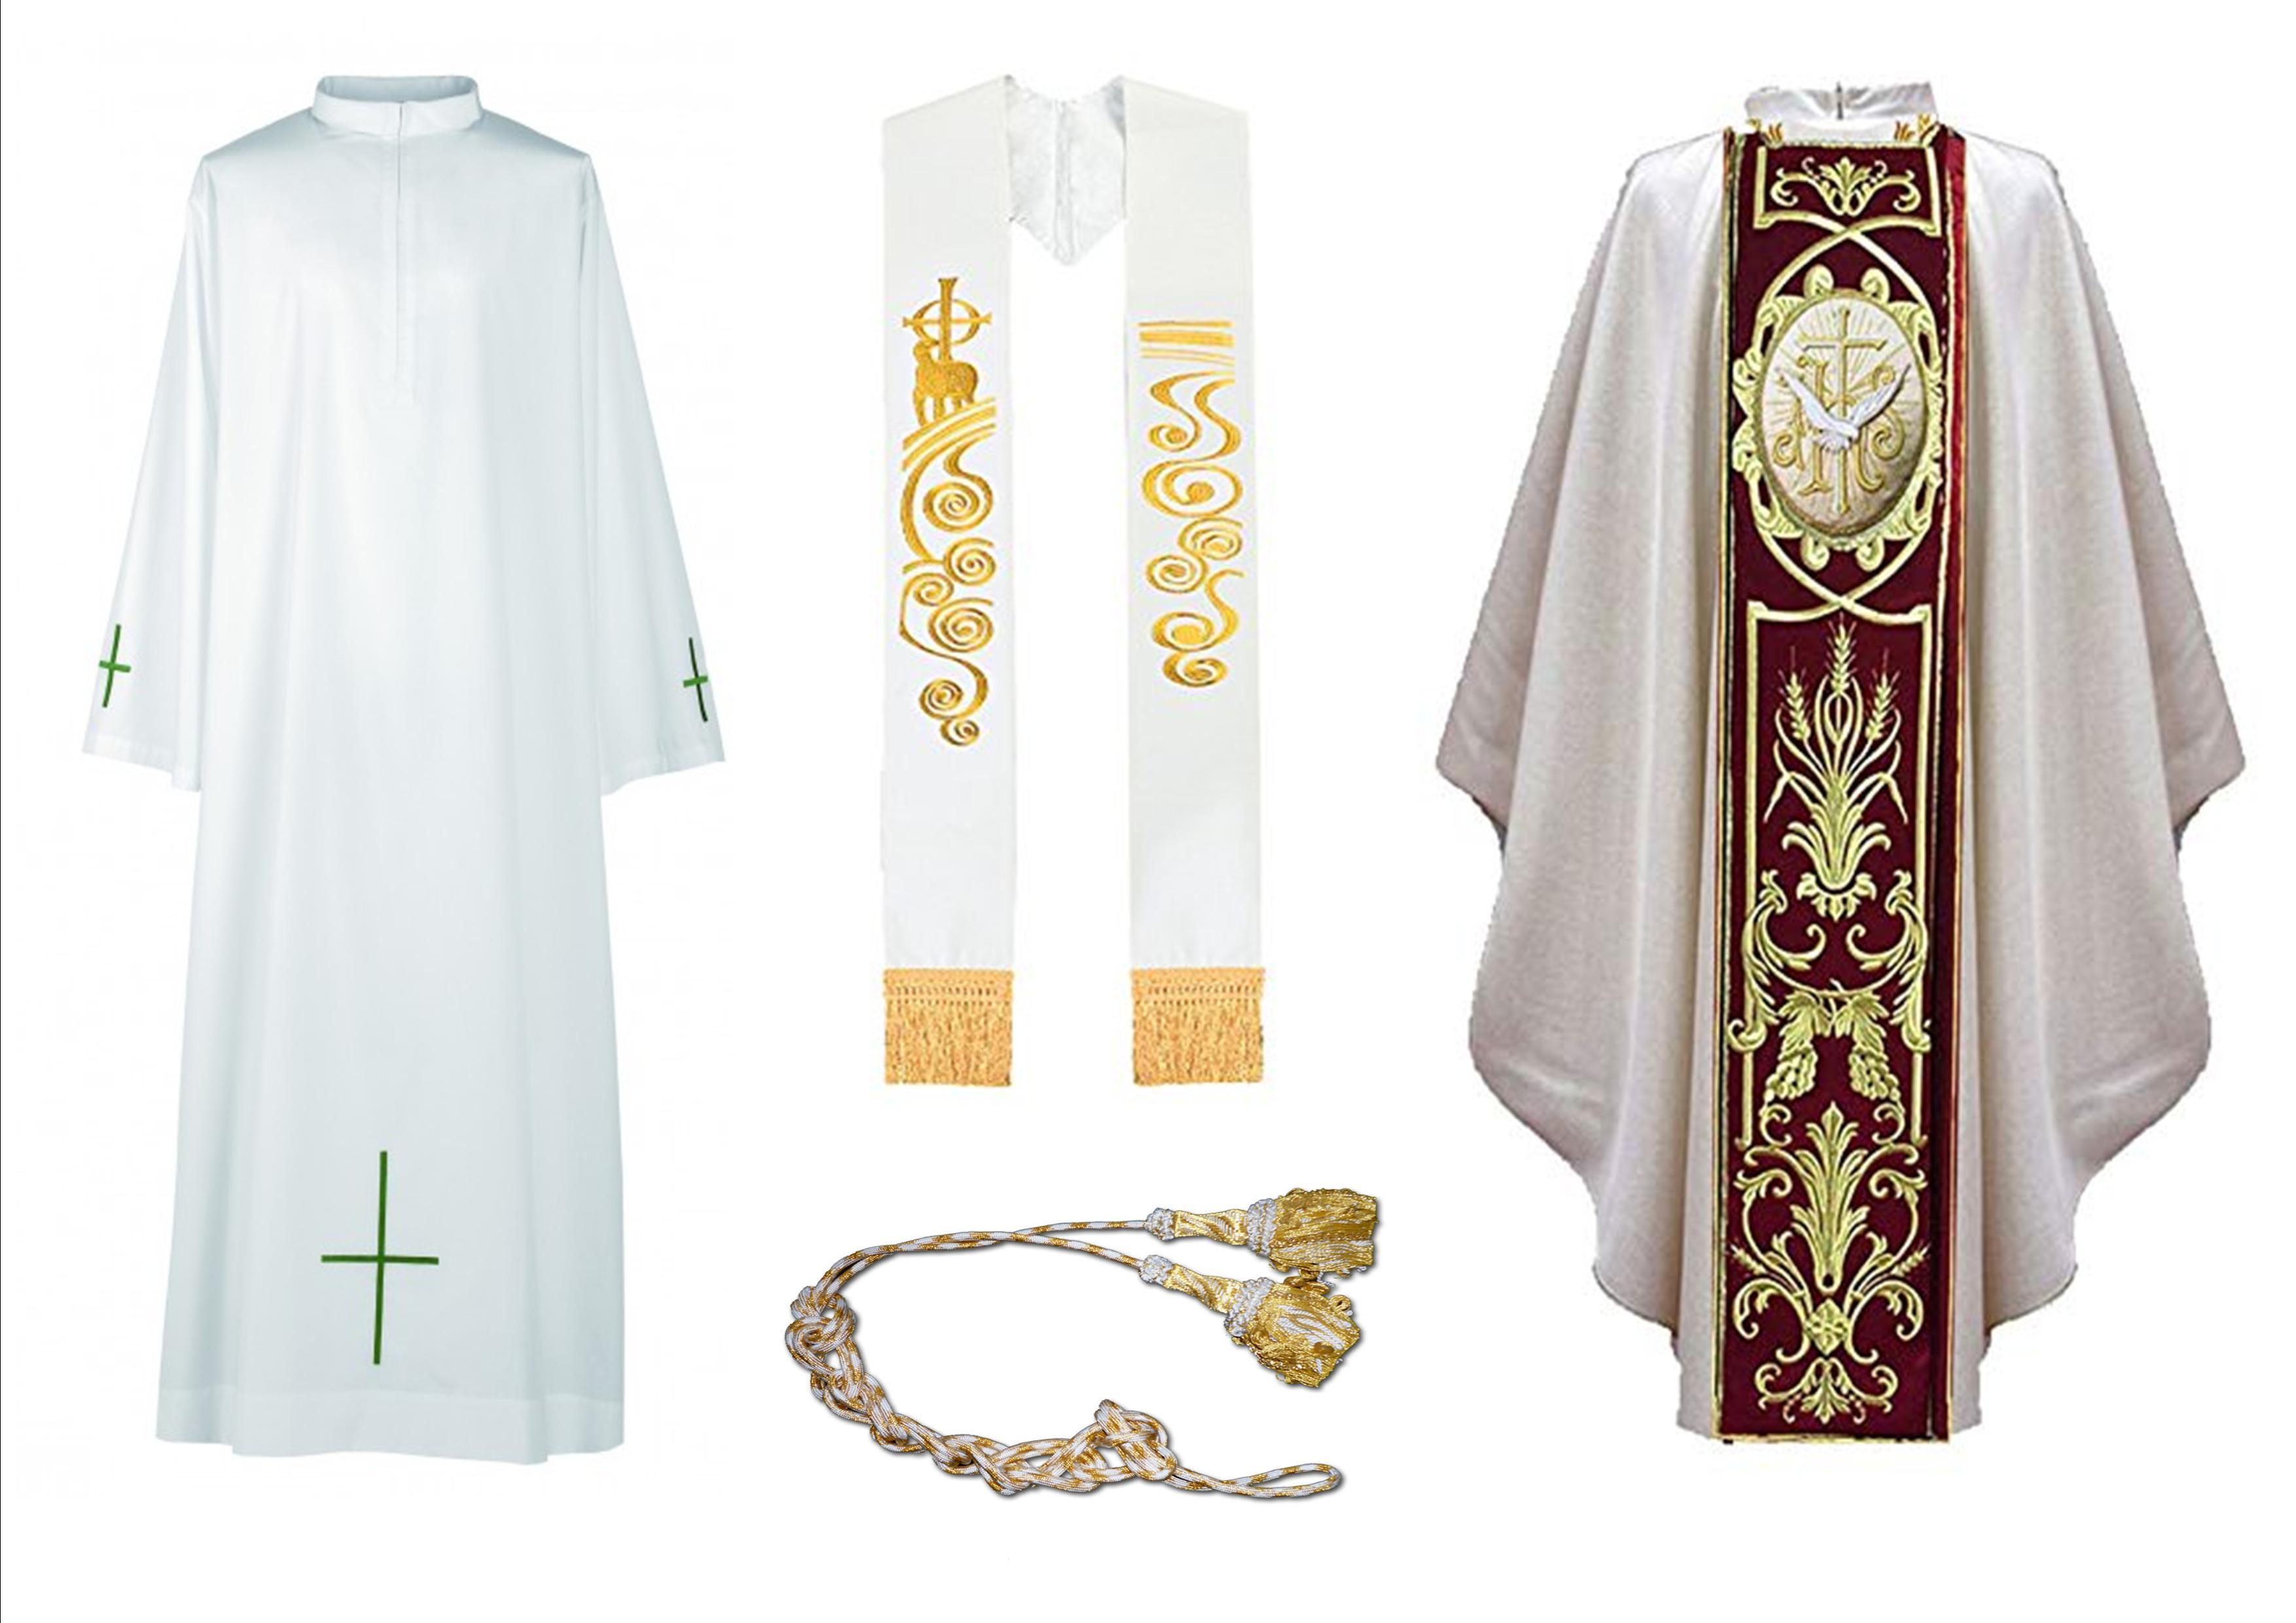 simbologia de las vestiduras litúrgicas